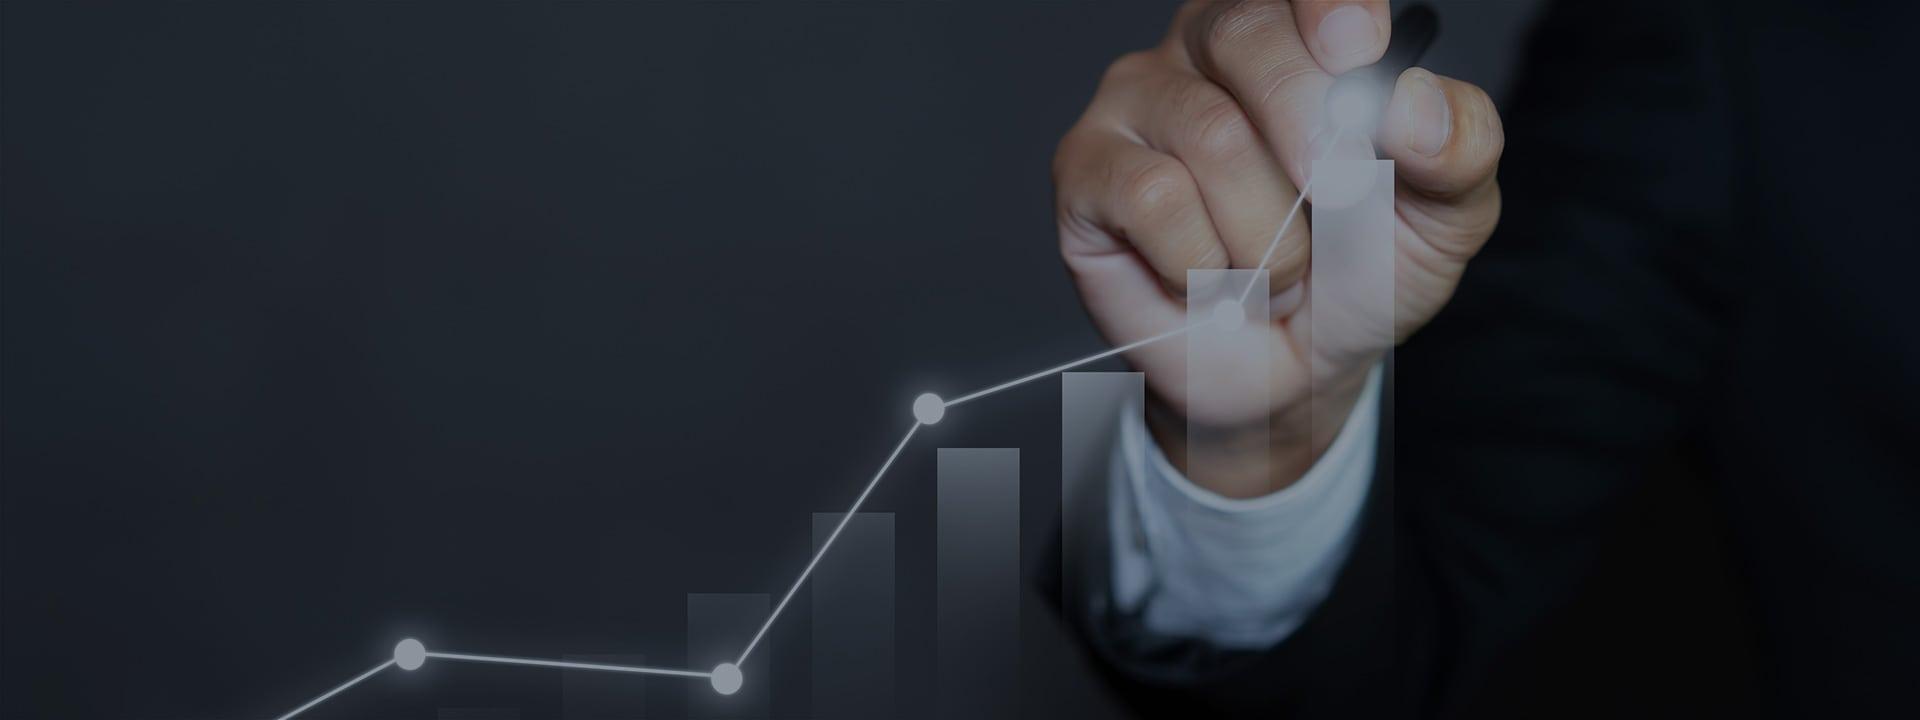 DataRobot Seven Steps to Reducing Customer Churn and Increasing revenue BG v.1.0